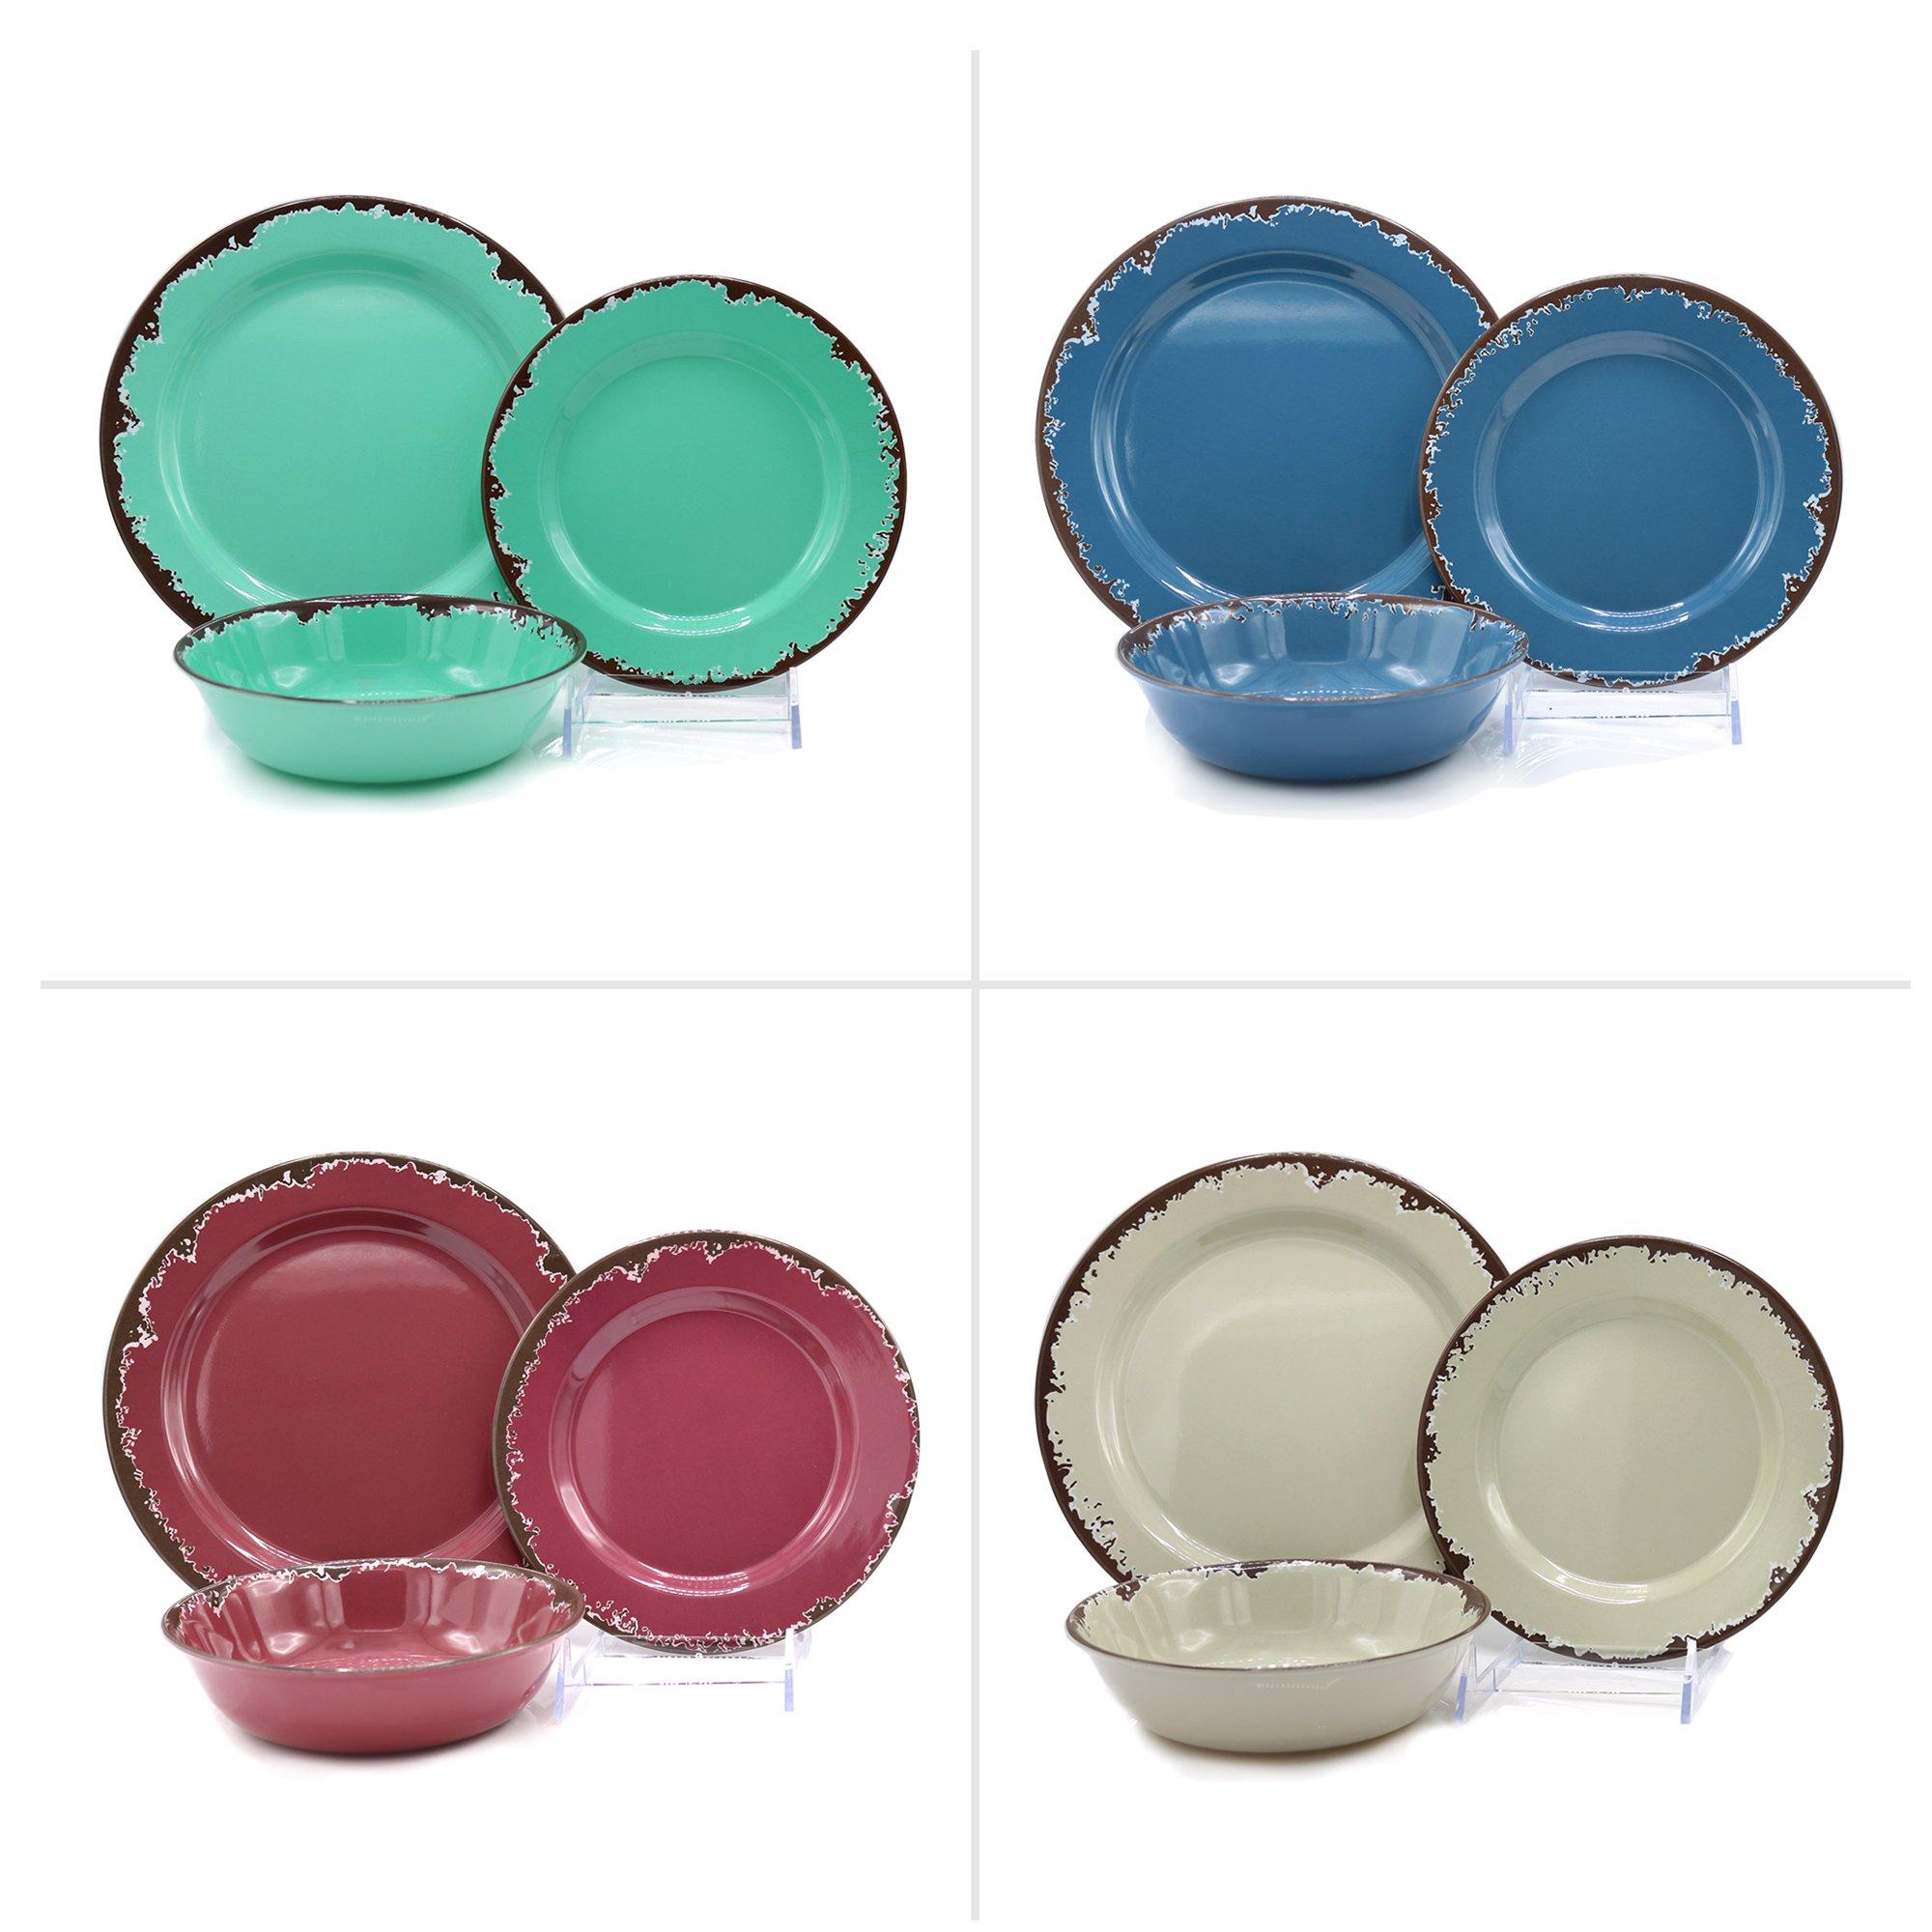 Rustic Melamine 餐具,12 件套,复古灵感,享受休闲用品,CTD 商店迷人的外观